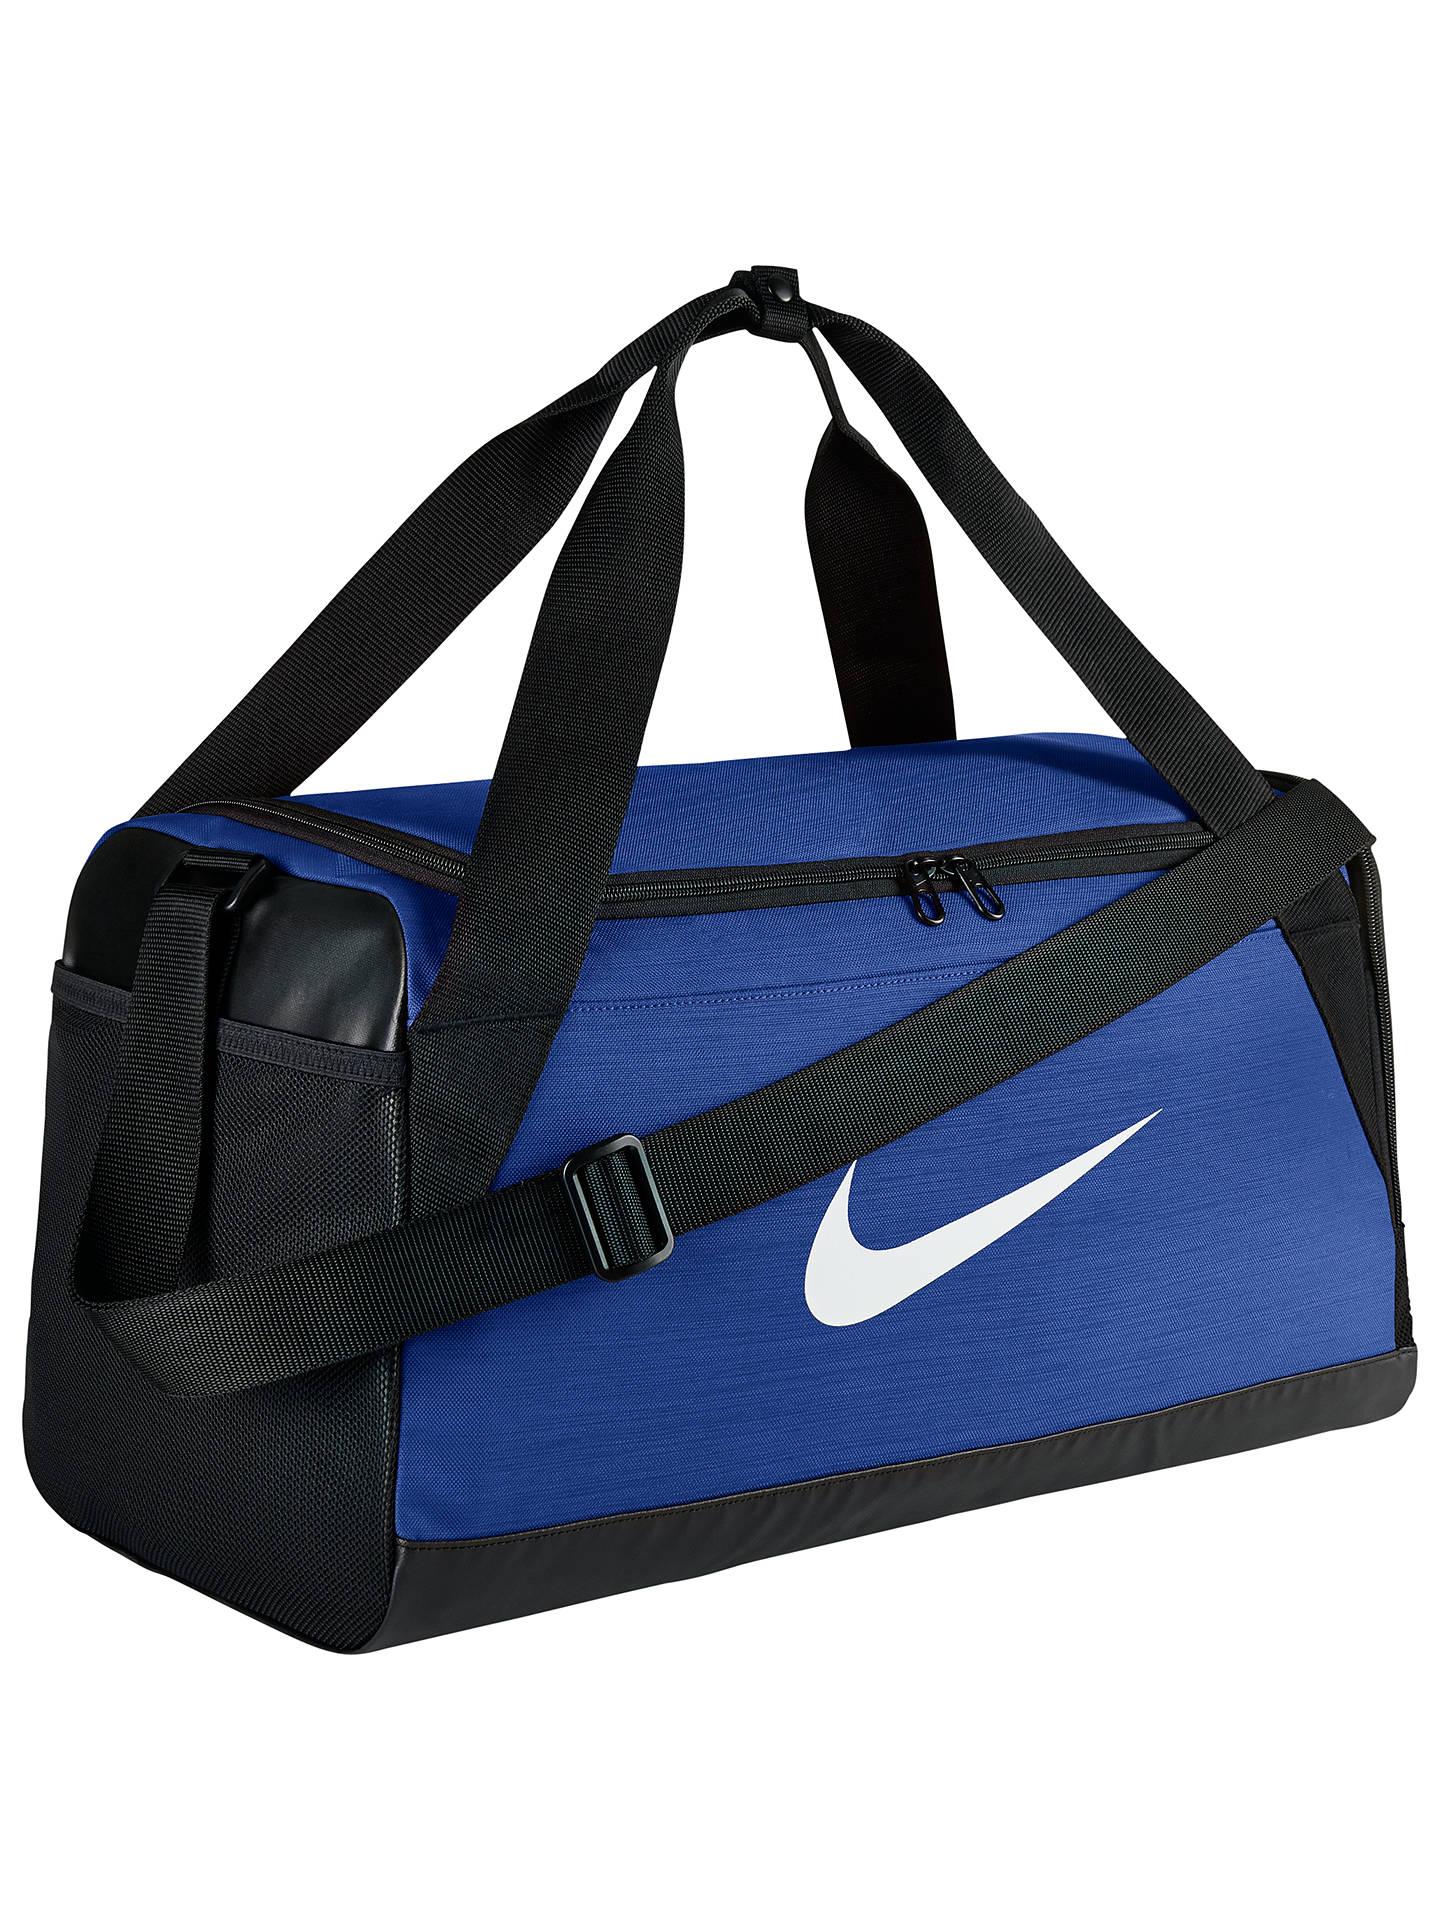 410ab2b0c86fe Buy Nike Brasilia Training Duffle Bag